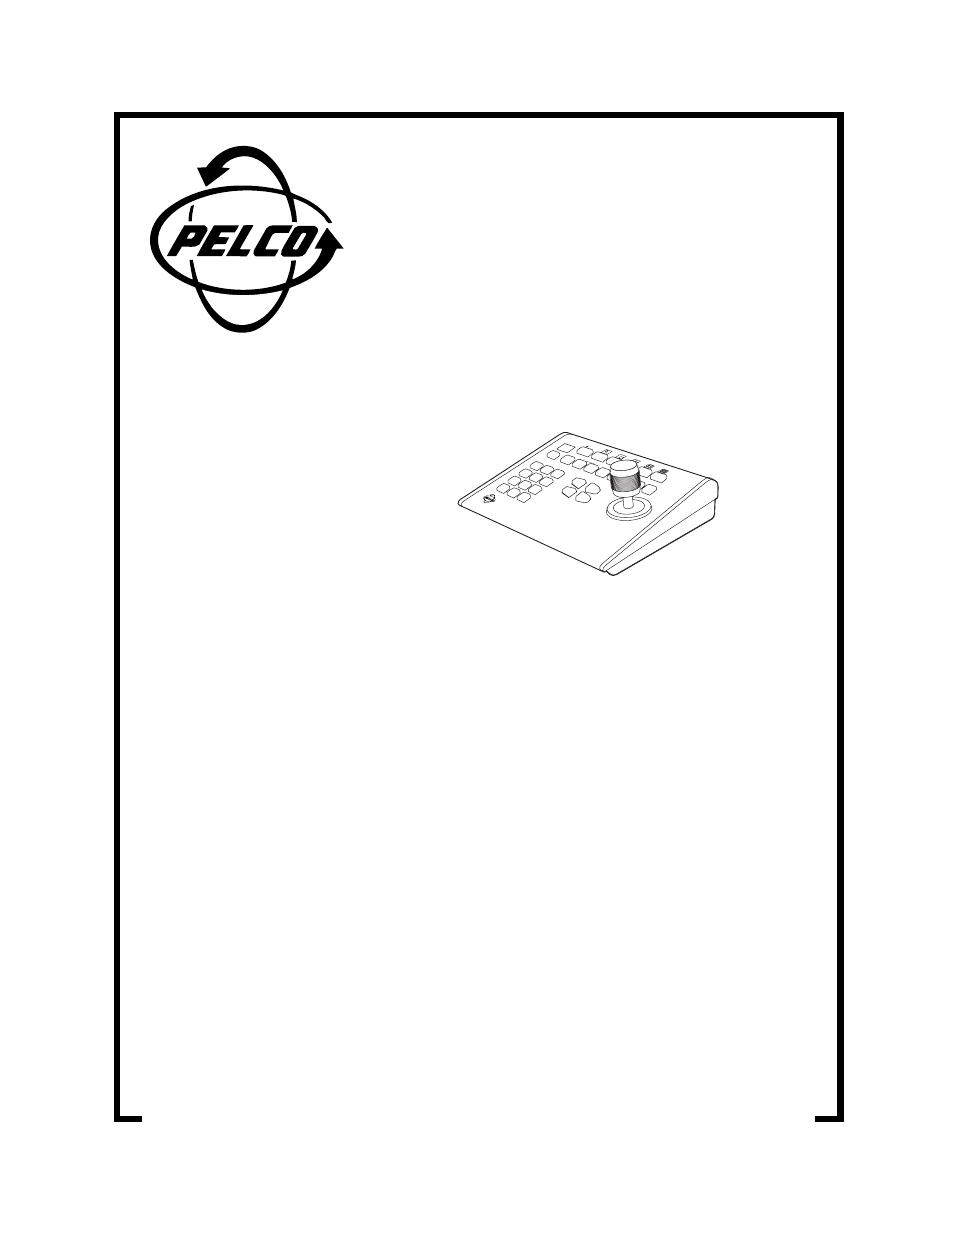 pelco kbd300 user manual 12 pages rh manualsdir com